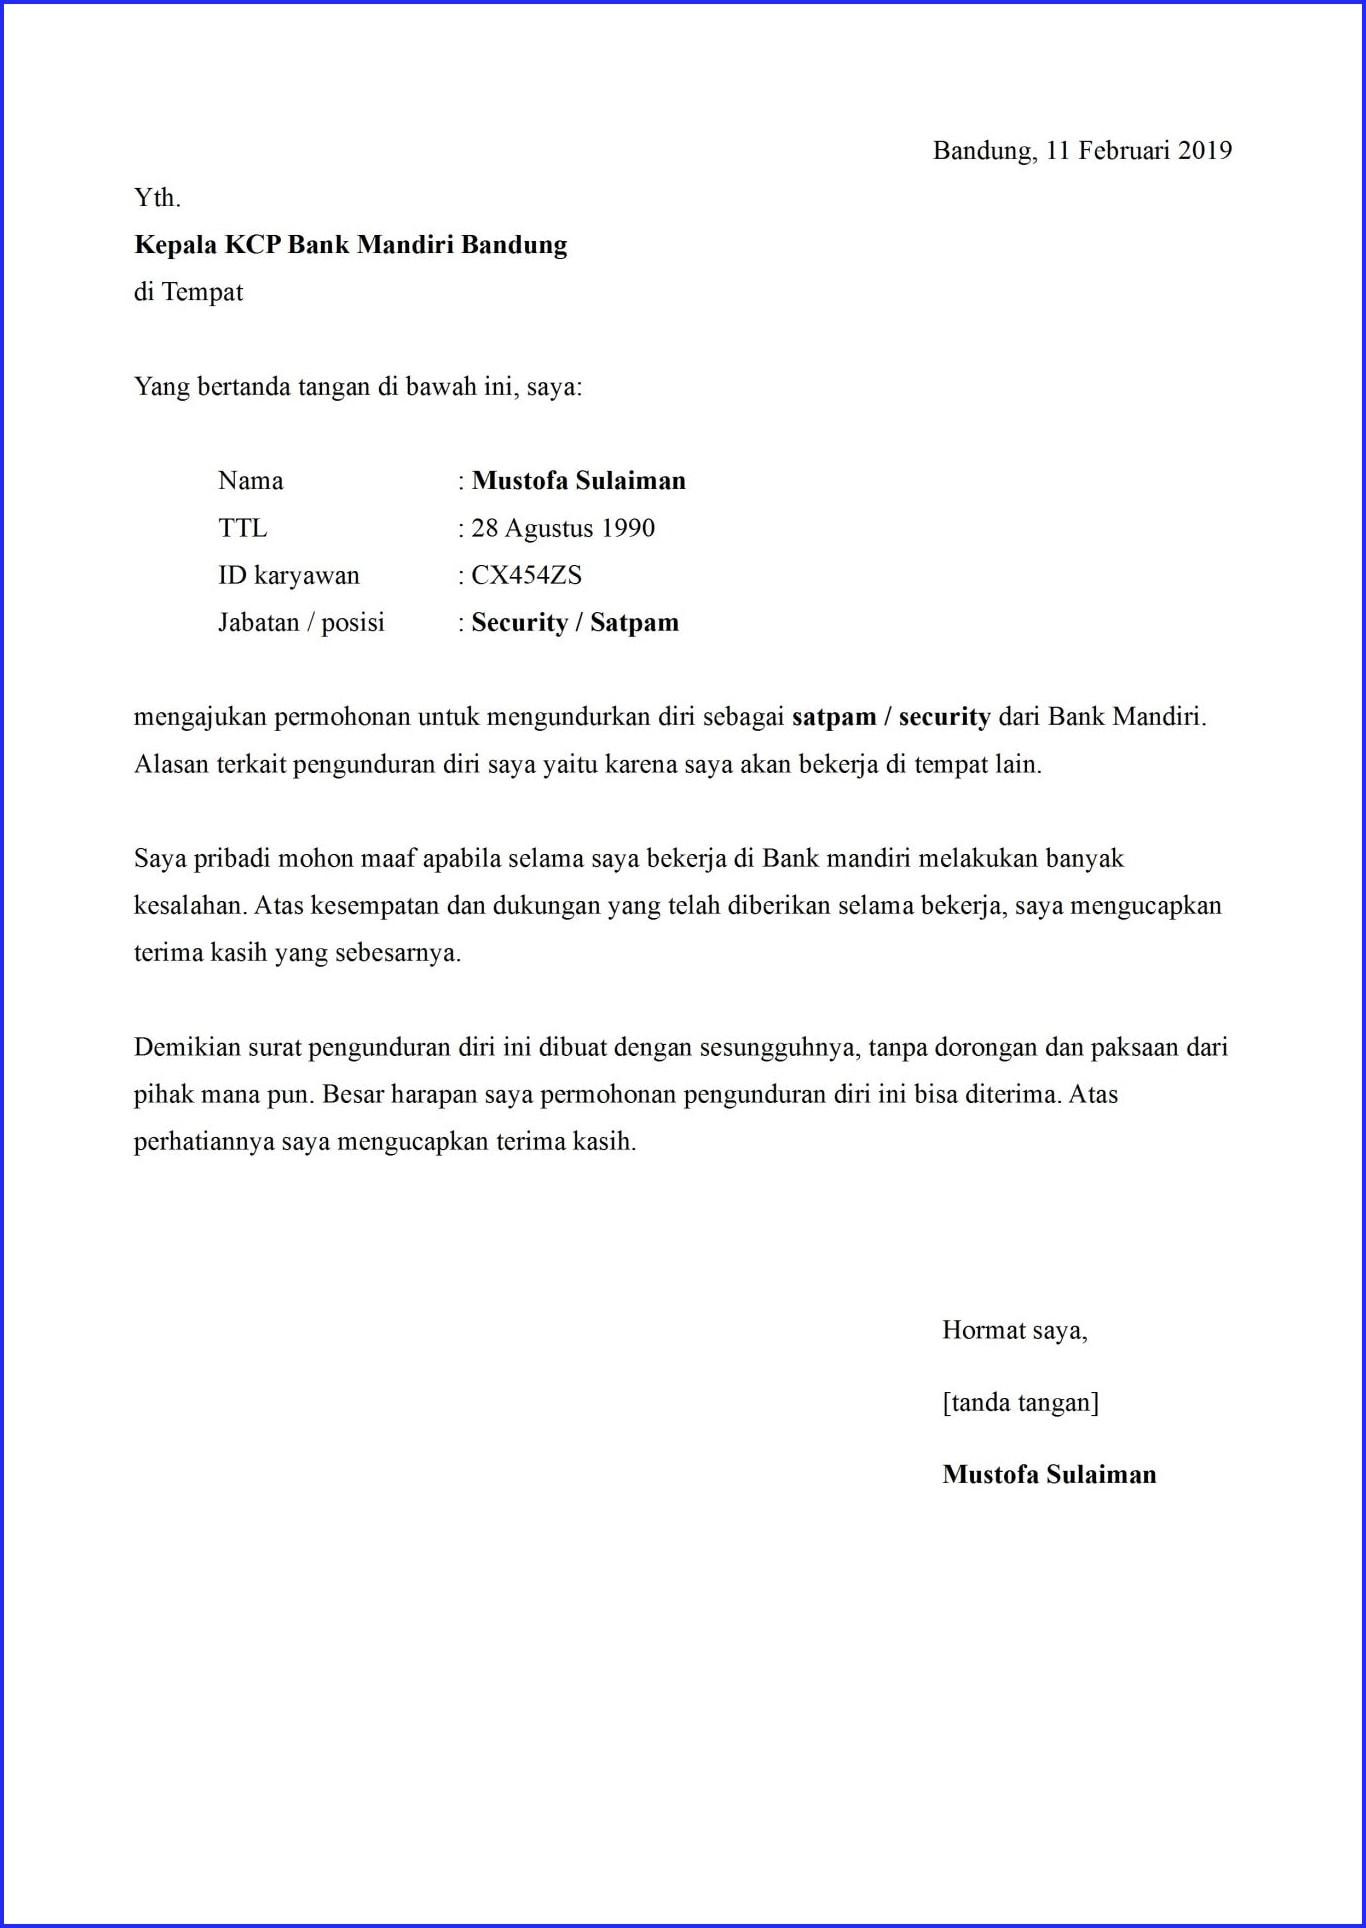 Permohonan Pengunduran Contoh Surat Pengunduran Diri Dari Pekerjaan